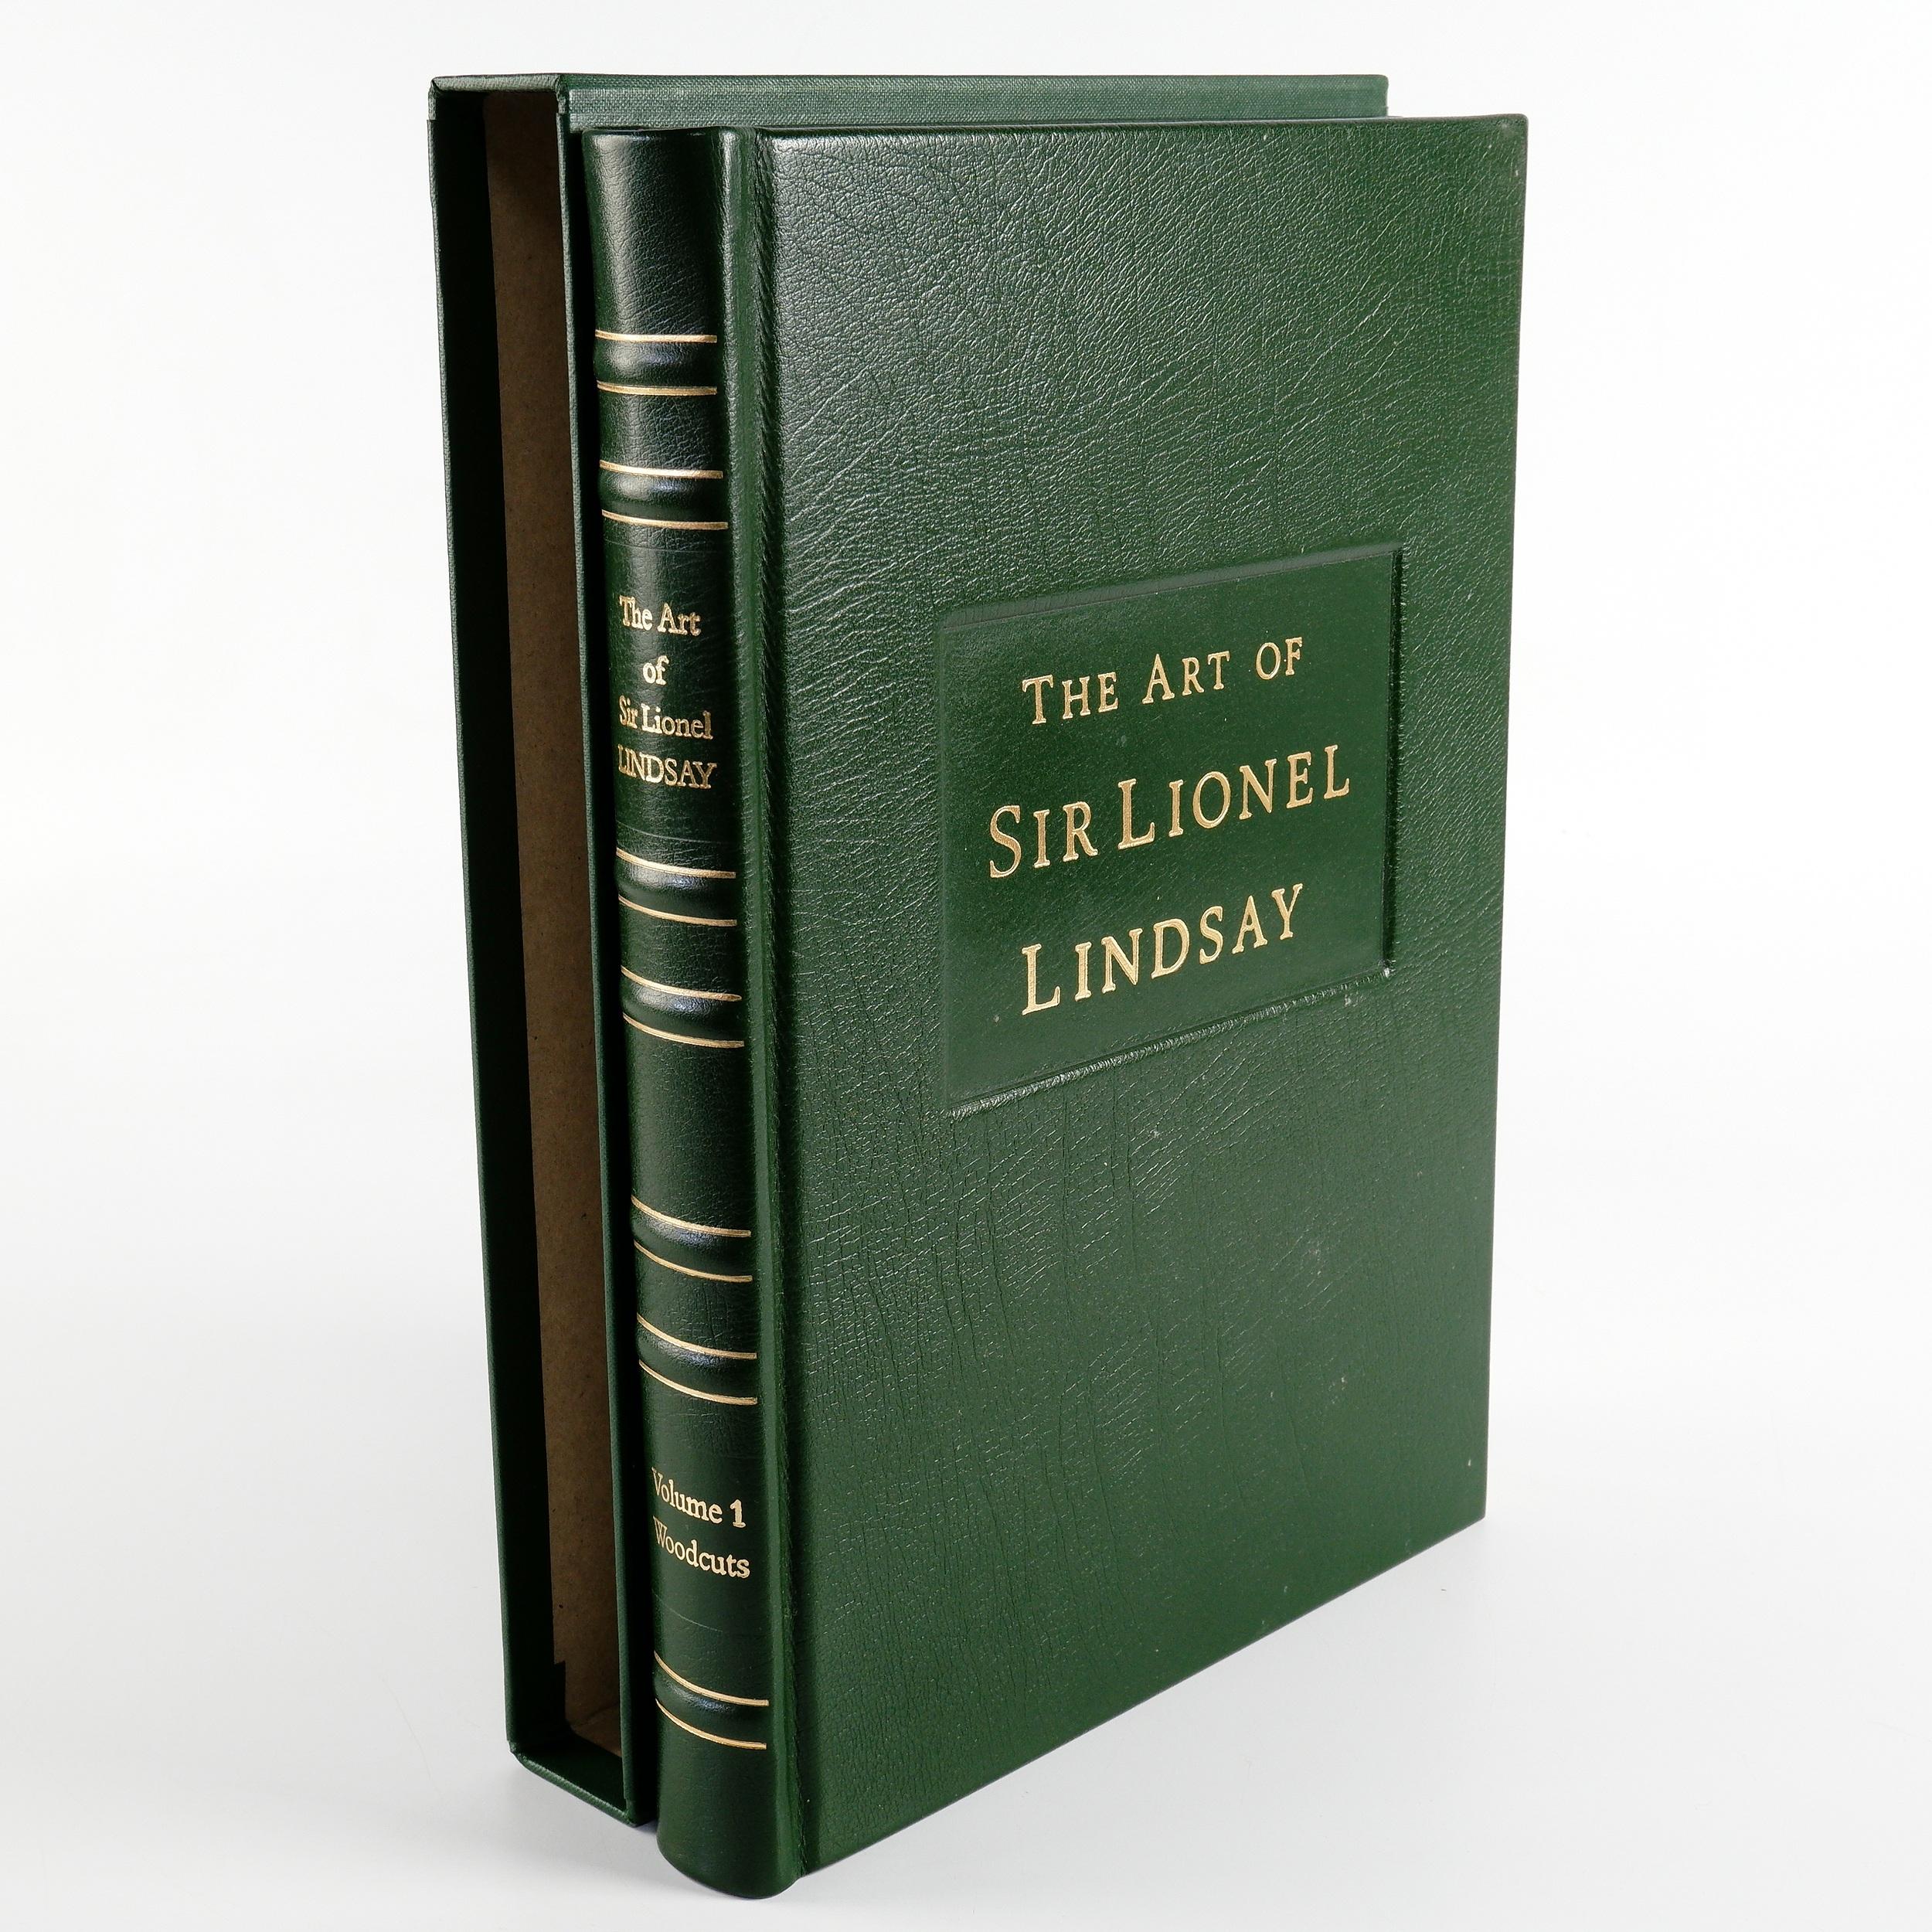 'Mendelssohn, Joanna , The Art of Sir Lionel Lindsay, Volume I Woodcuts, Edition 260/300 '